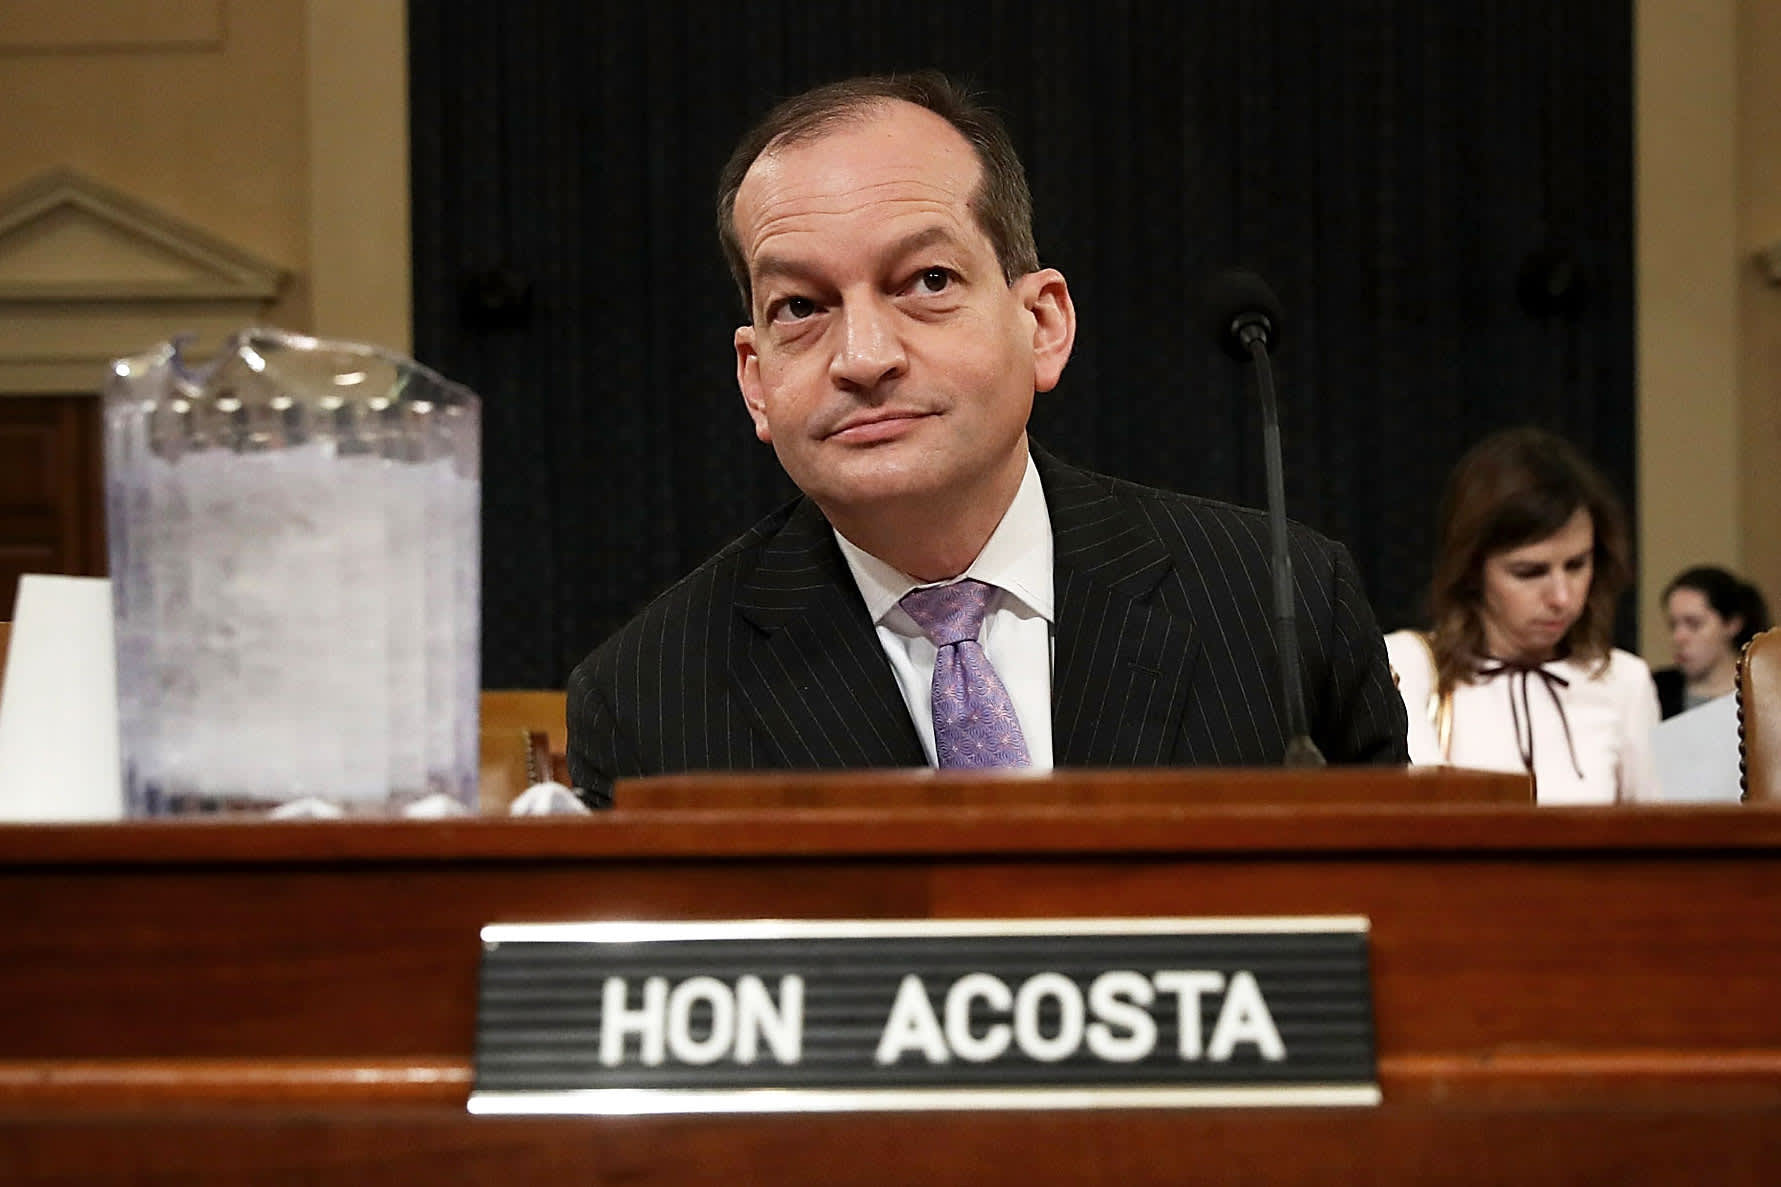 Labor Secretary Alex Acosta is resigning as pressure mounts from Jeffrey Epstein case